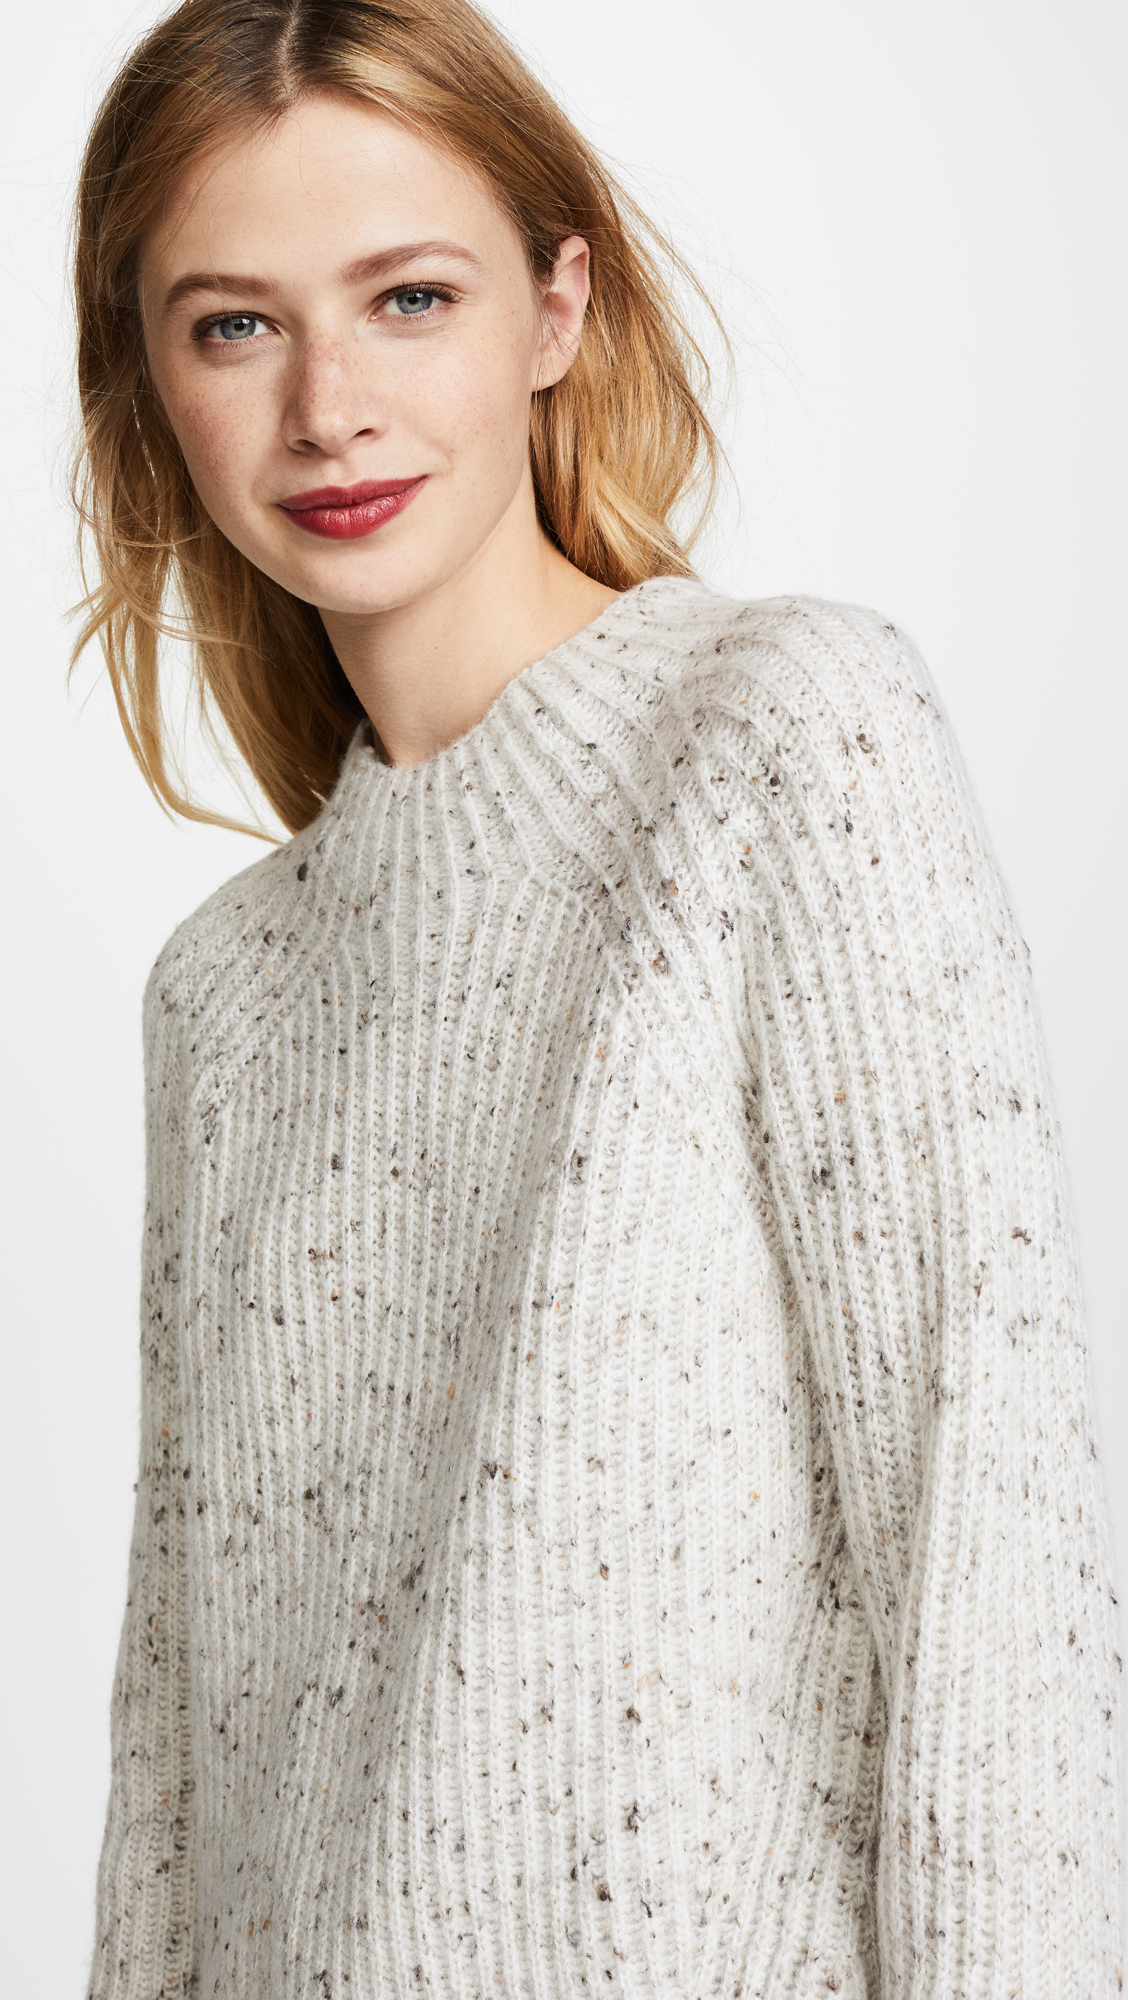 c700914323c Madewell Donegal Karen Mock Neck Sweater